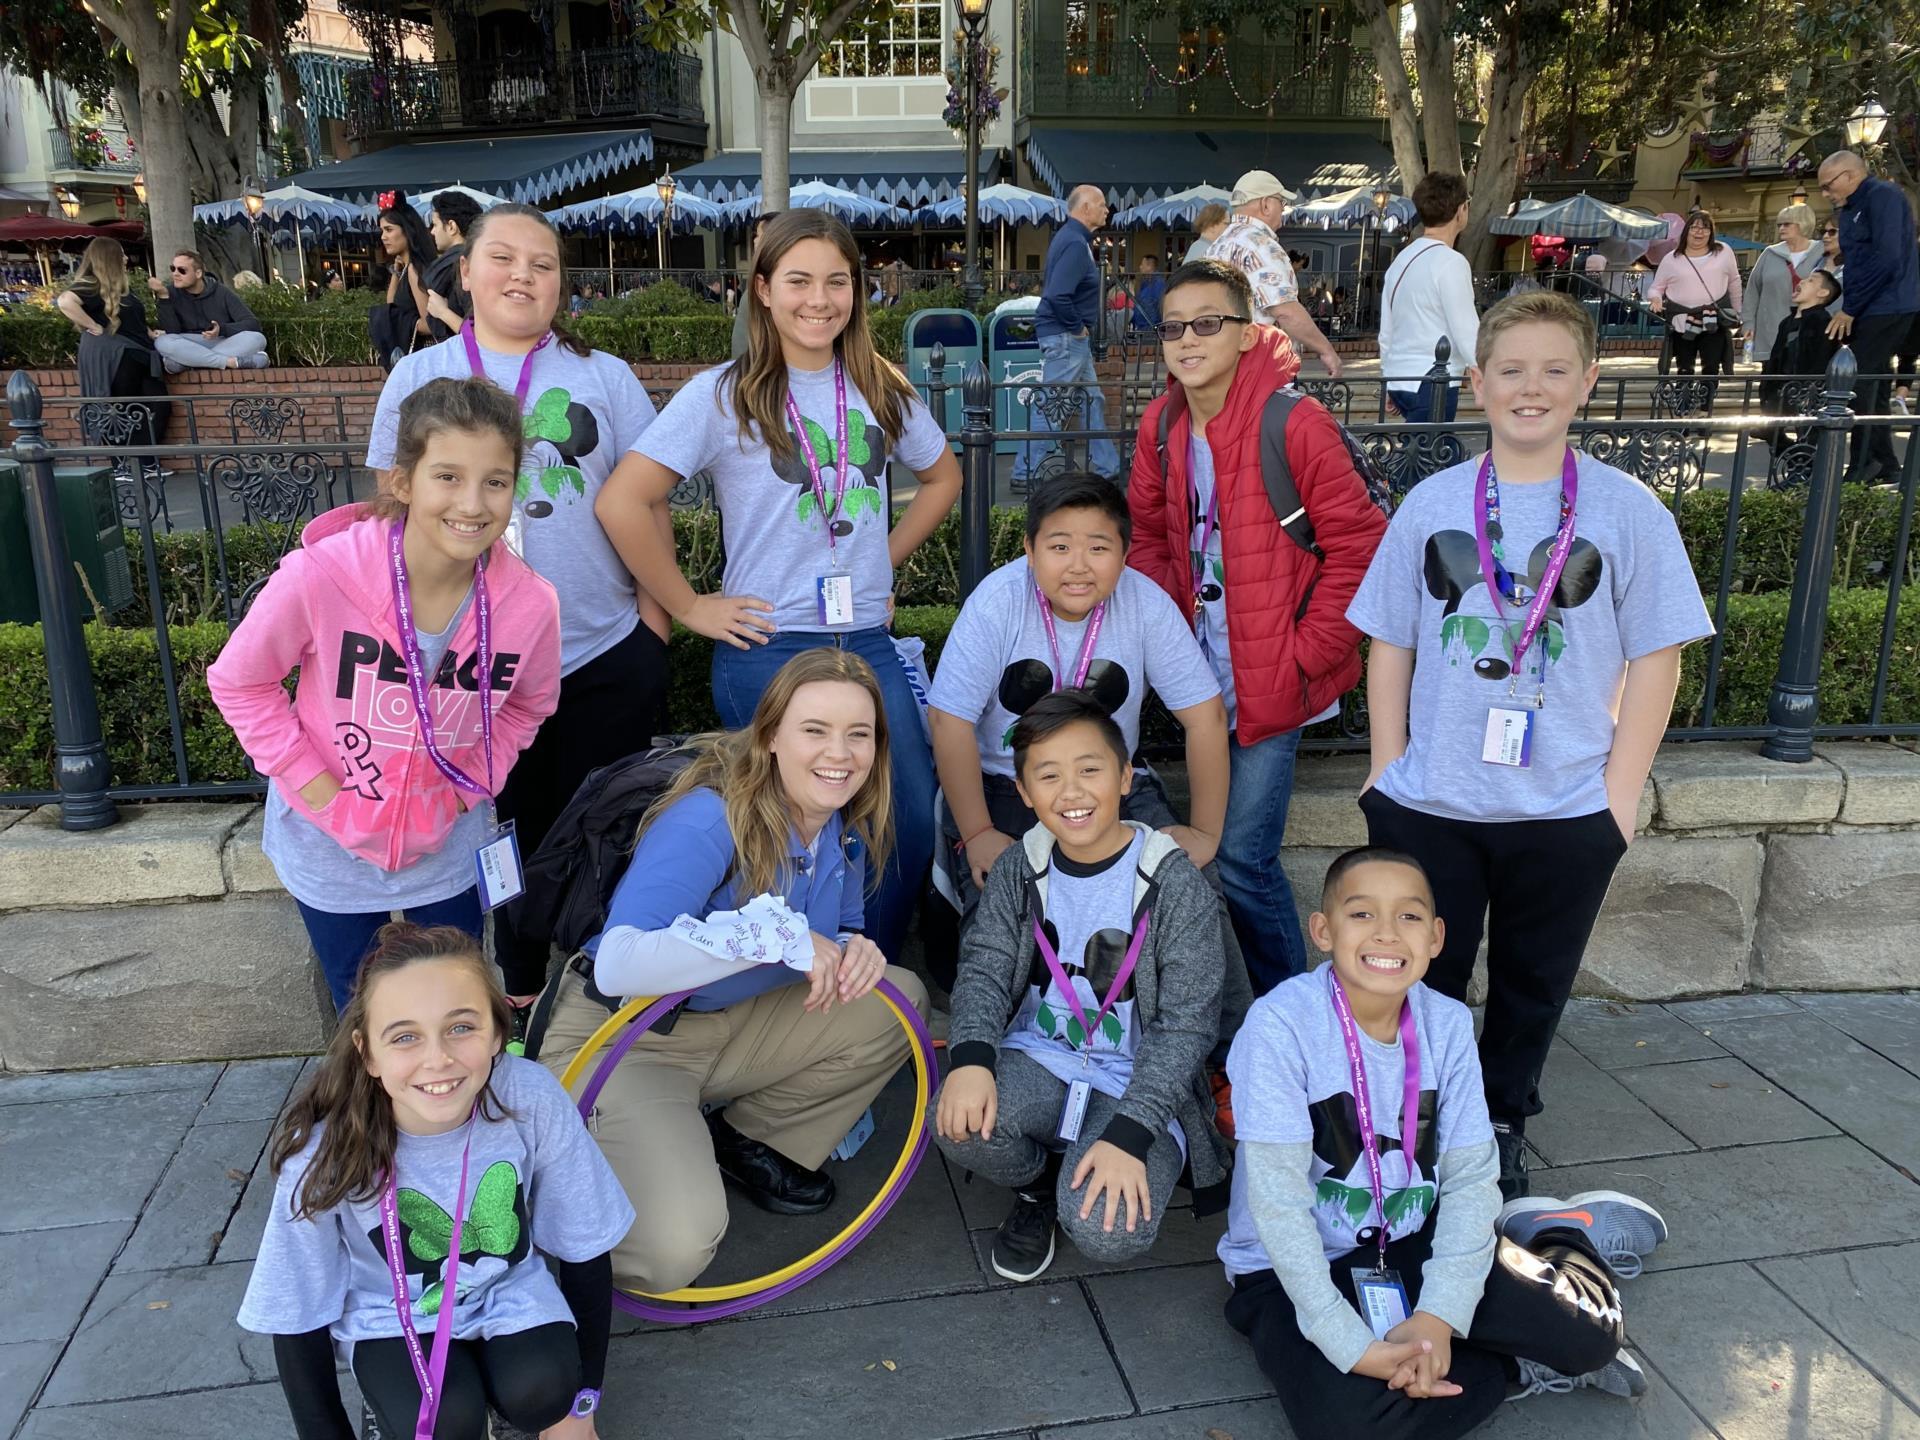 Disney Leadership Camp